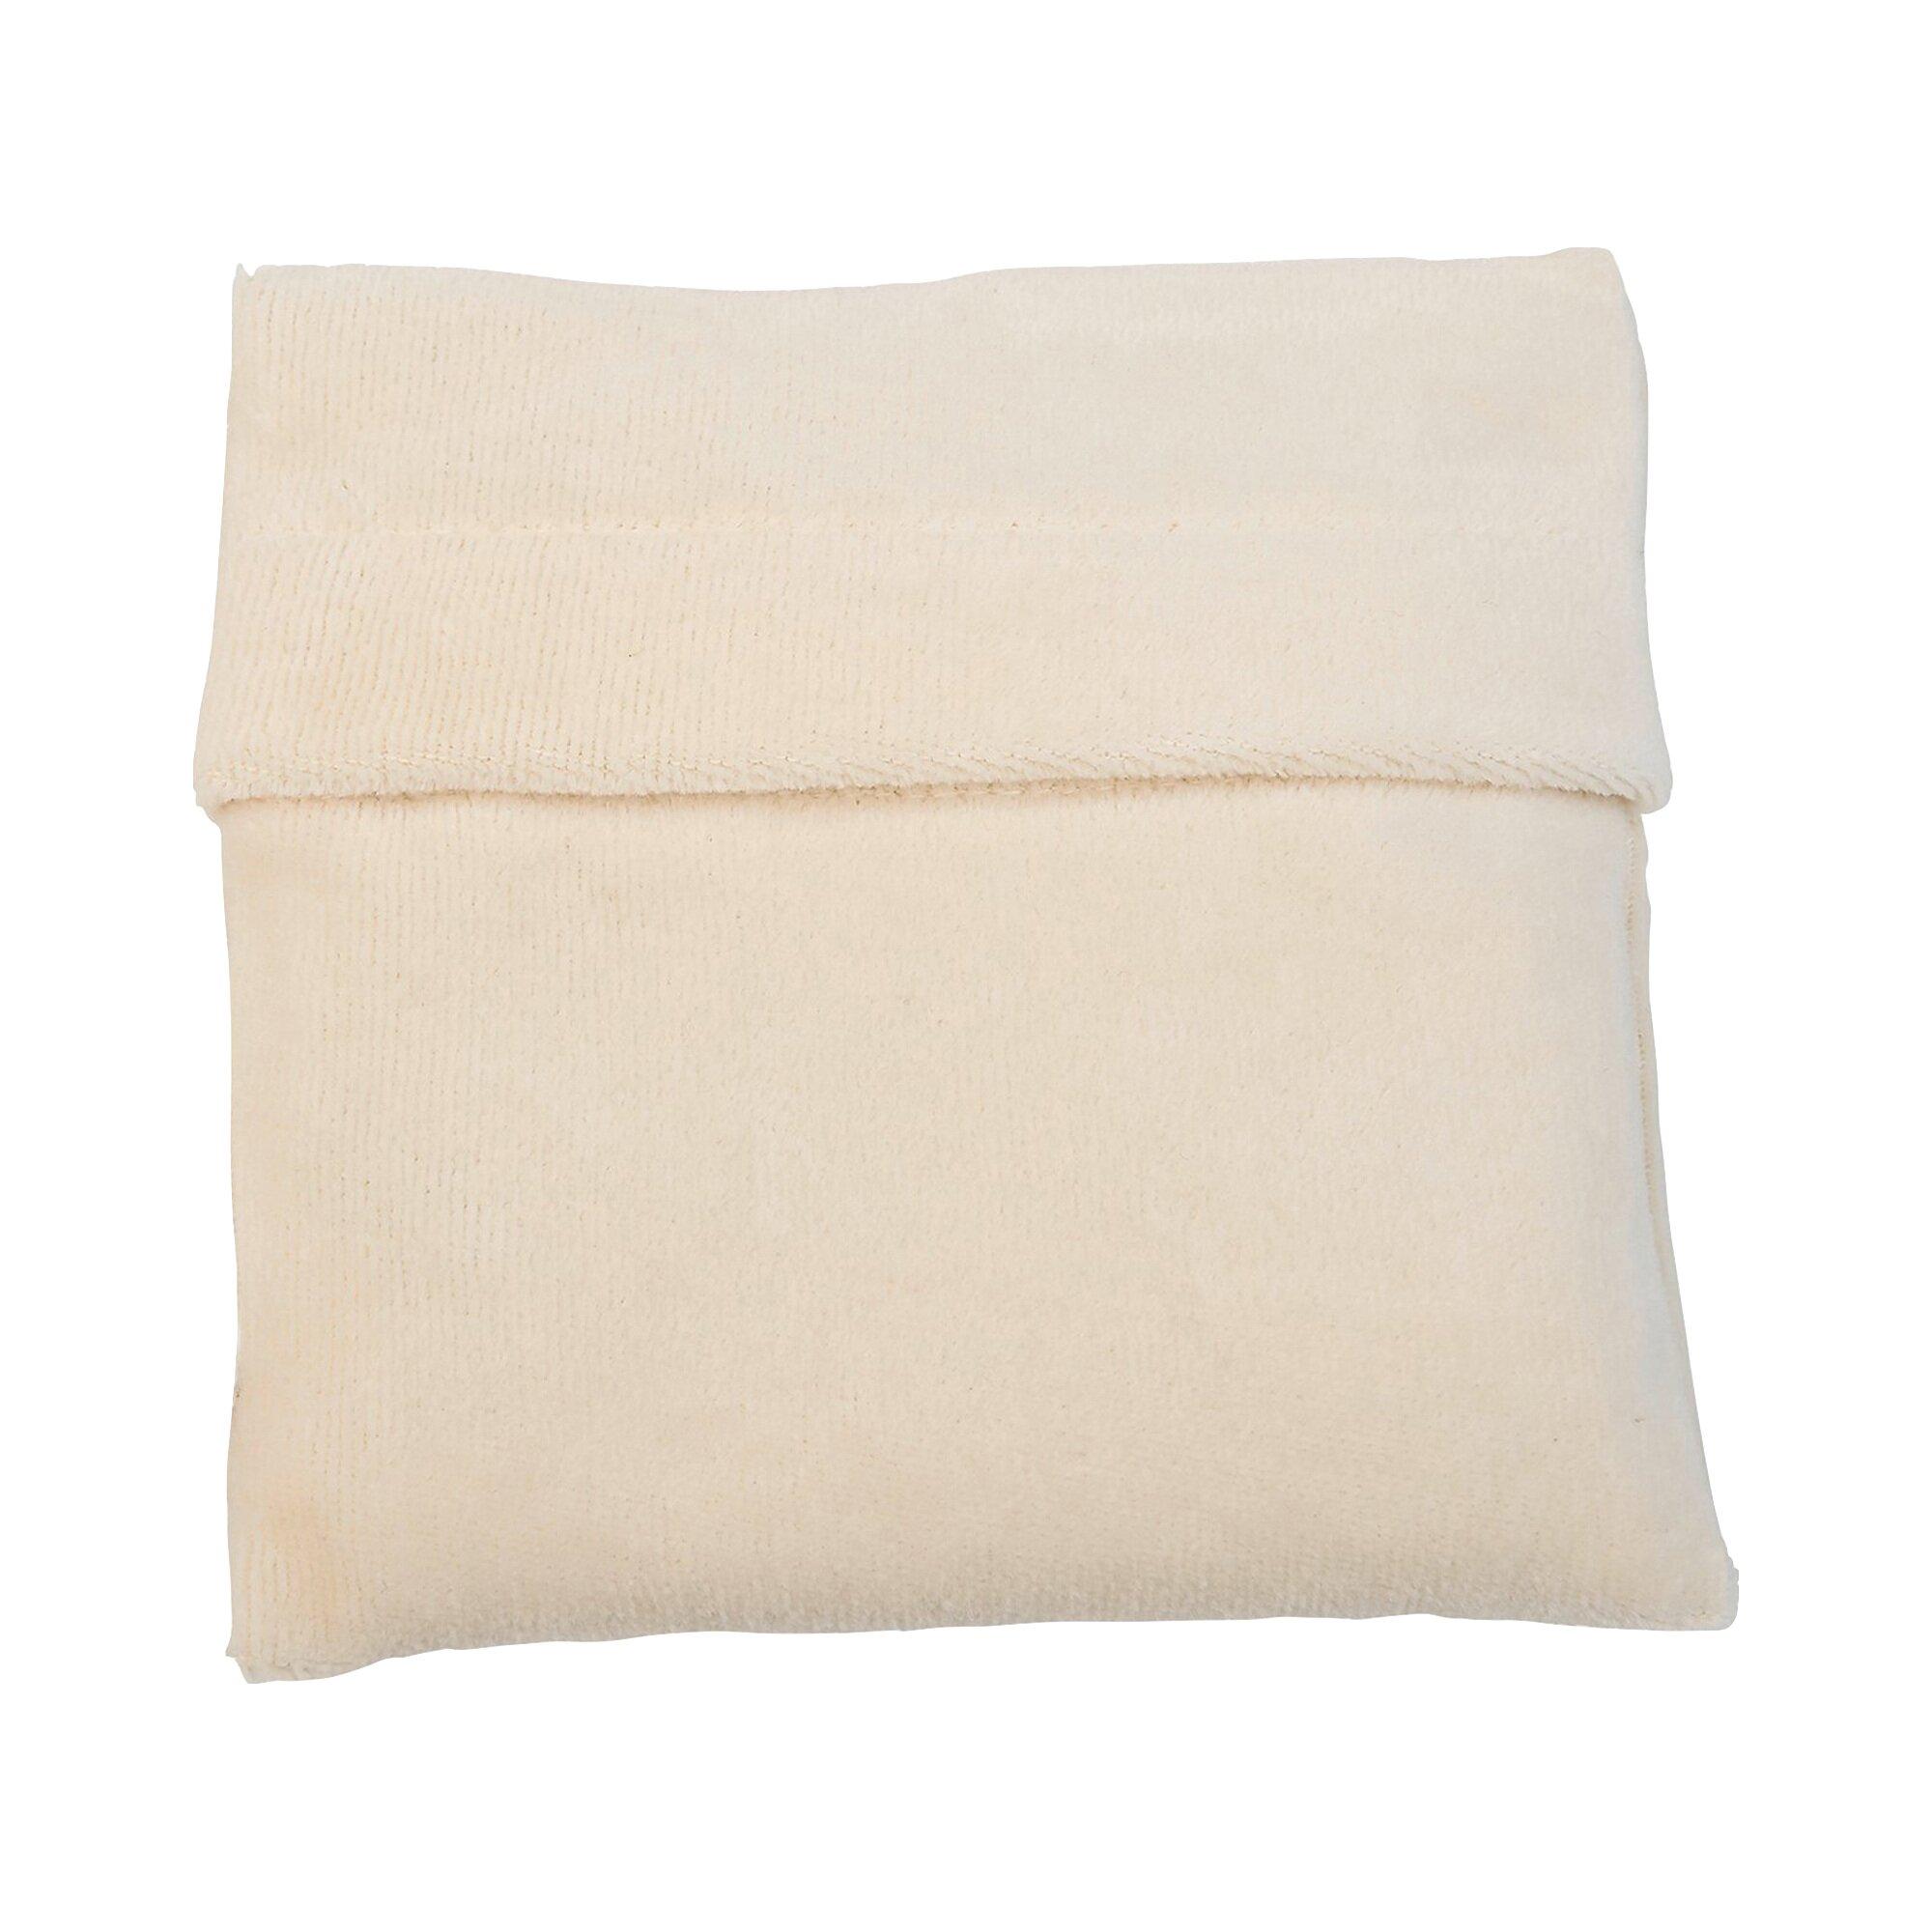 grunspecht-warmekissen-mit-bio-leinsamenfullung-bar-beige